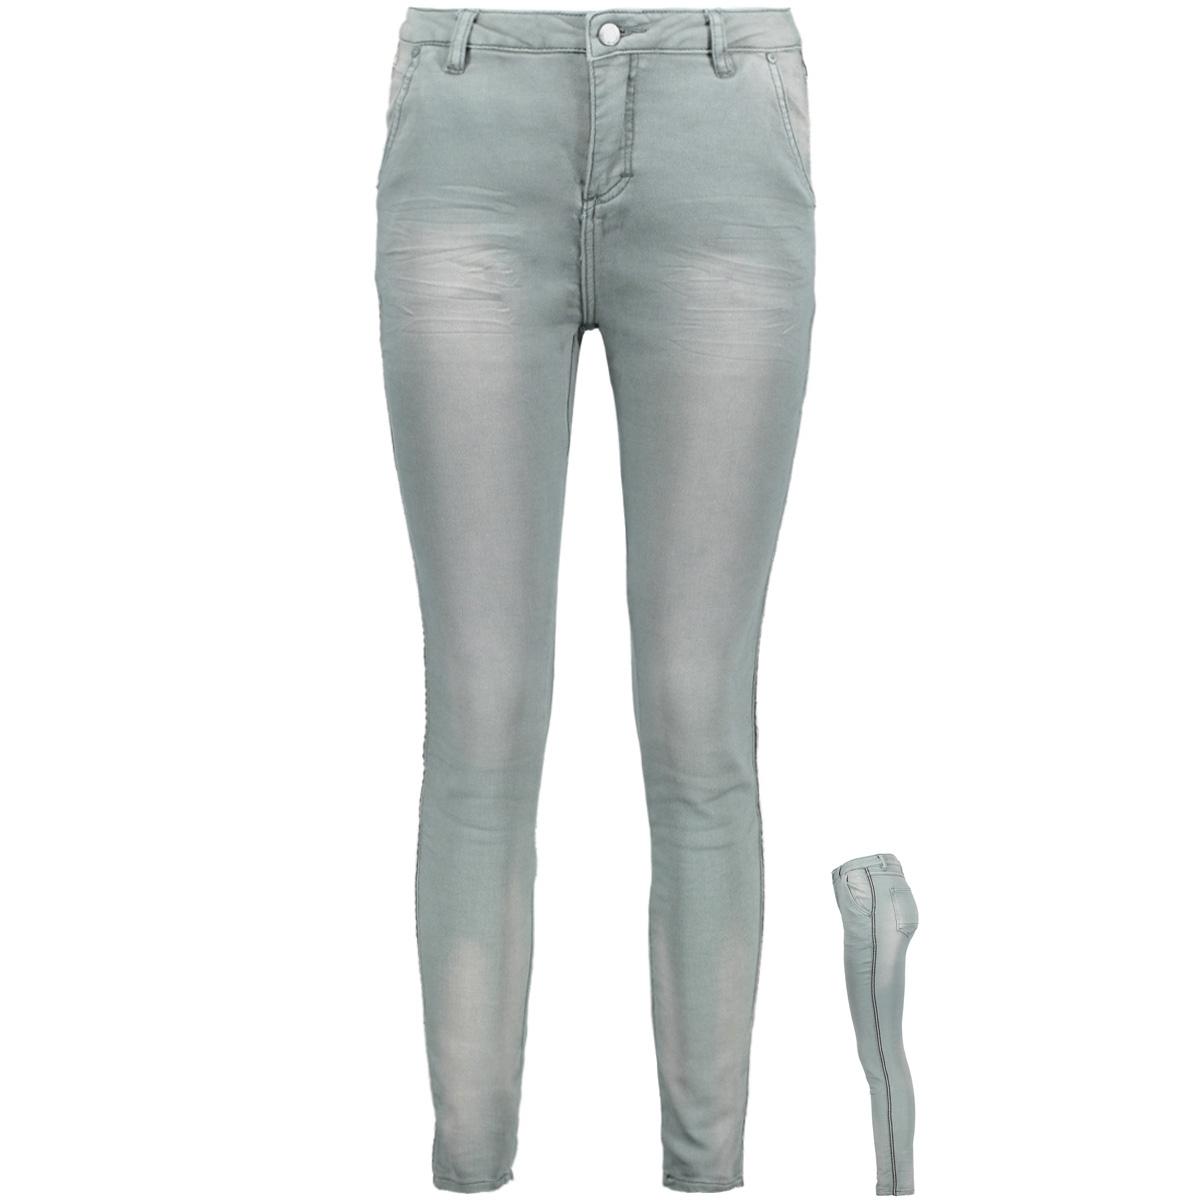 w17.29.2090 rubi jogg circle of trust jeans urban chic